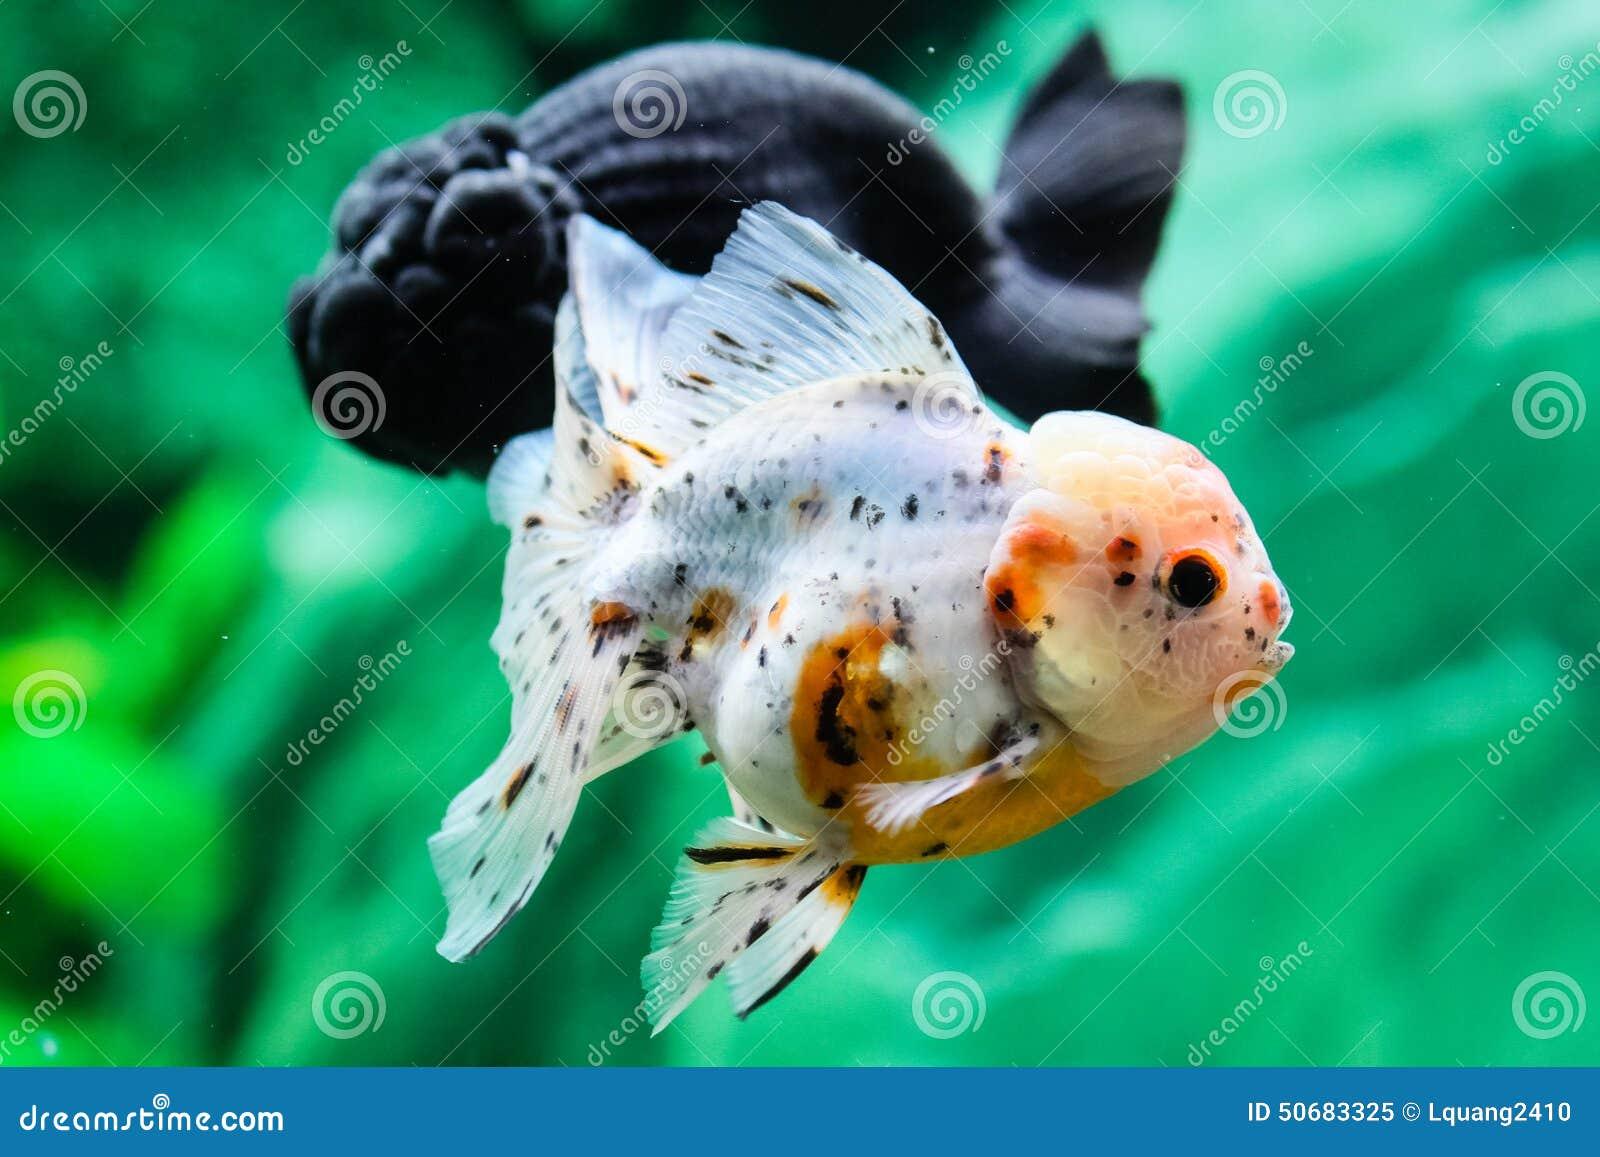 Download 关闭在水族馆的金鱼 库存图片. 图片 包括有 金子, 行动, 下落, beauvoir, 弯脚的, 本质 - 50683325